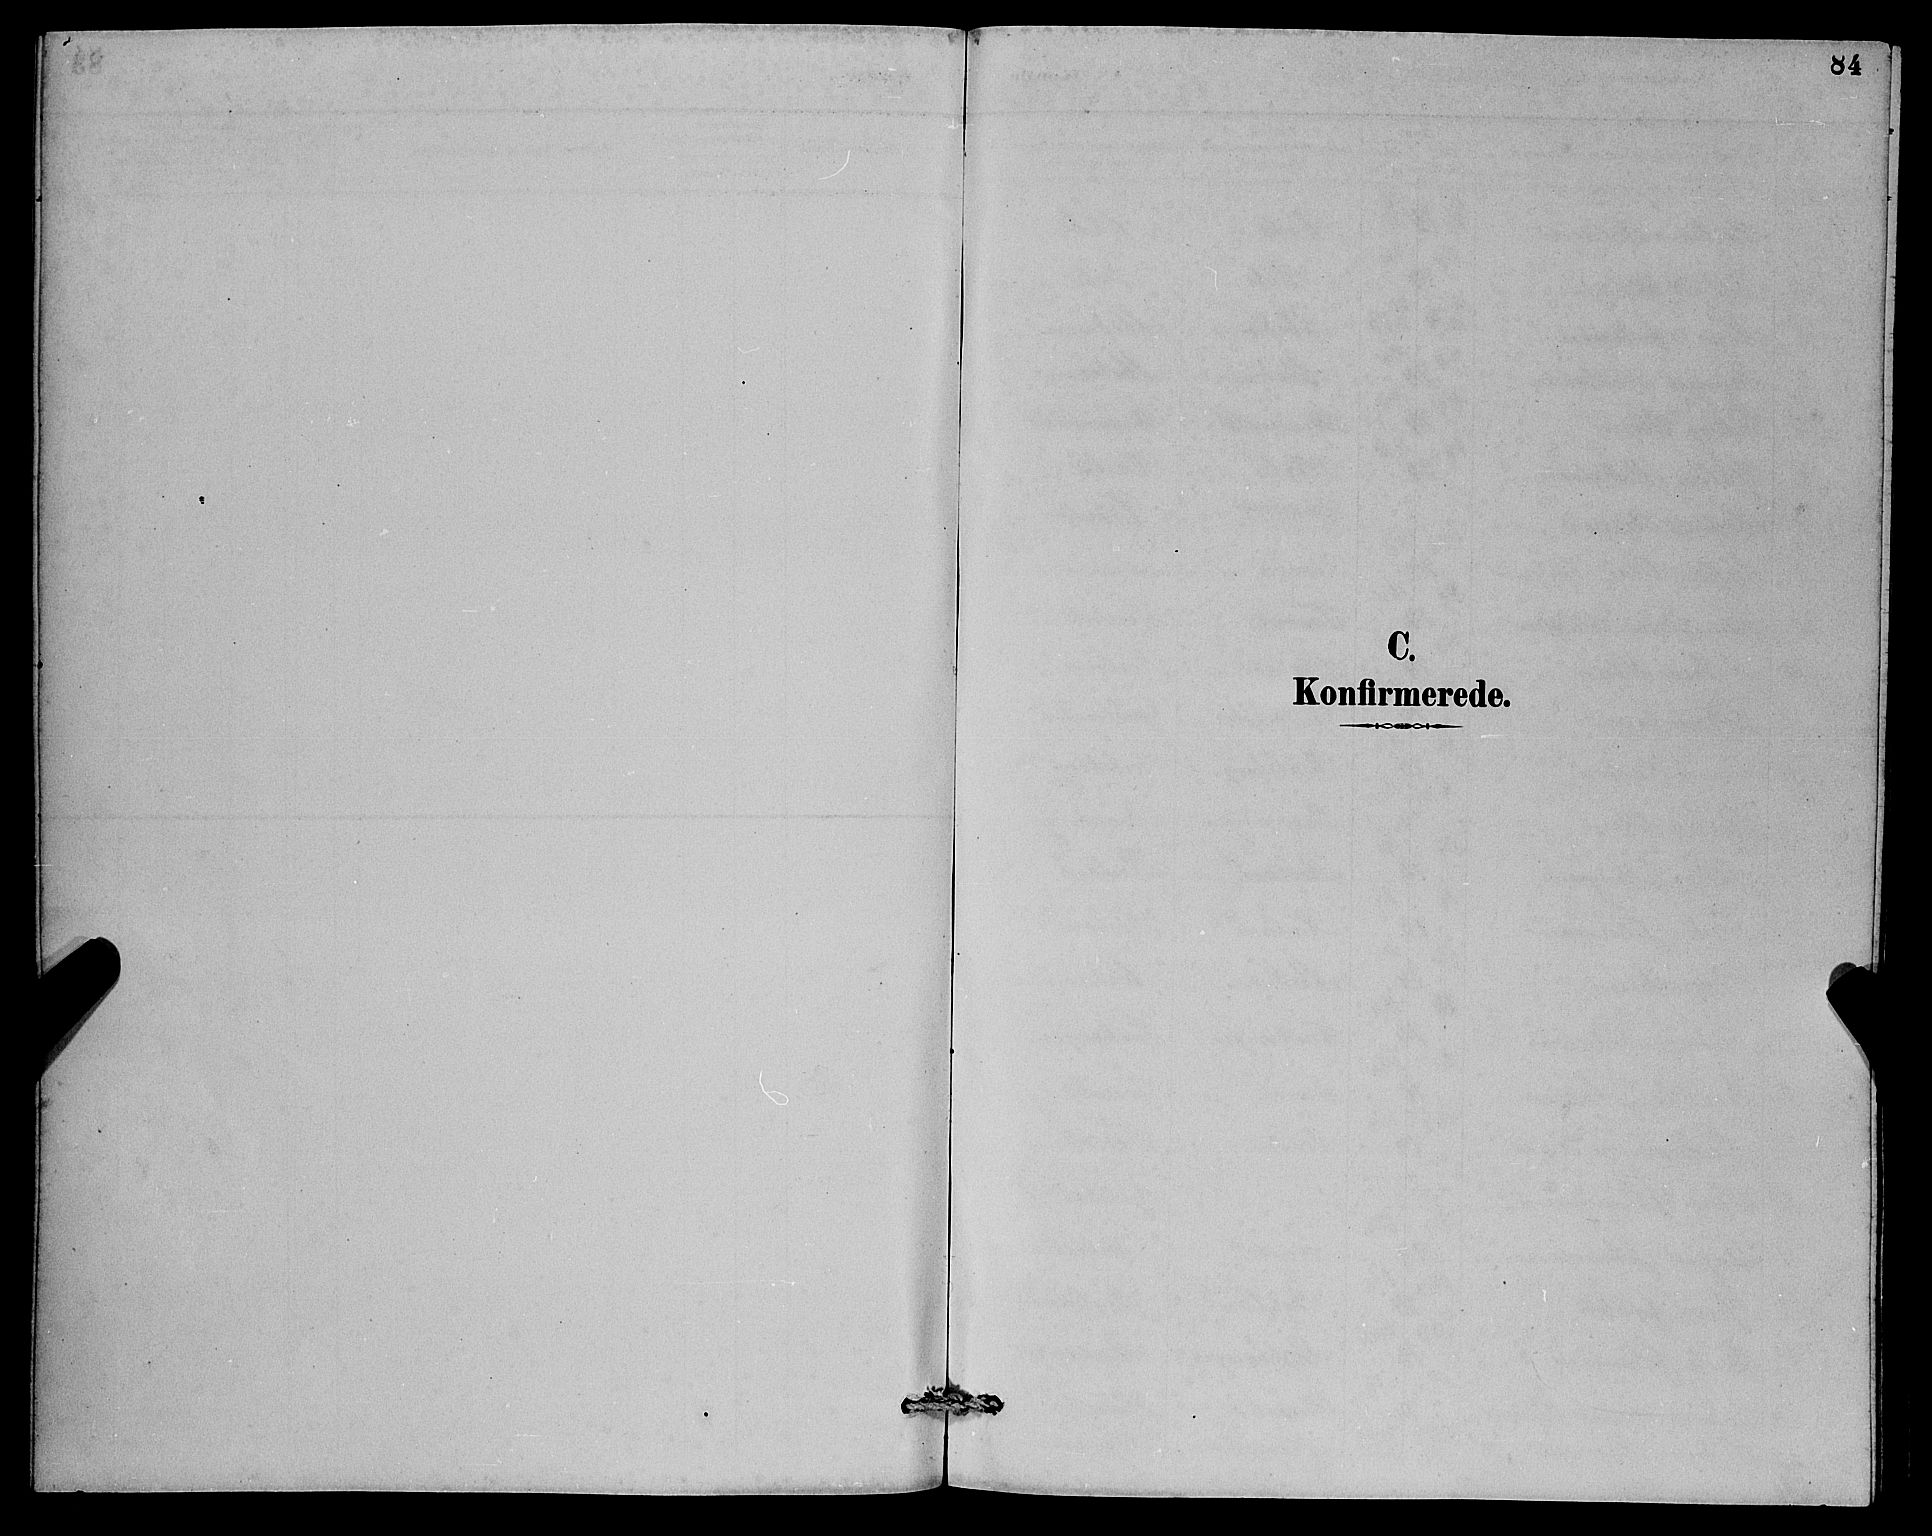 SAB, Herdla Sokneprestembete, H/Hab: Klokkerbok nr. A 3, 1889-1899, s. 84